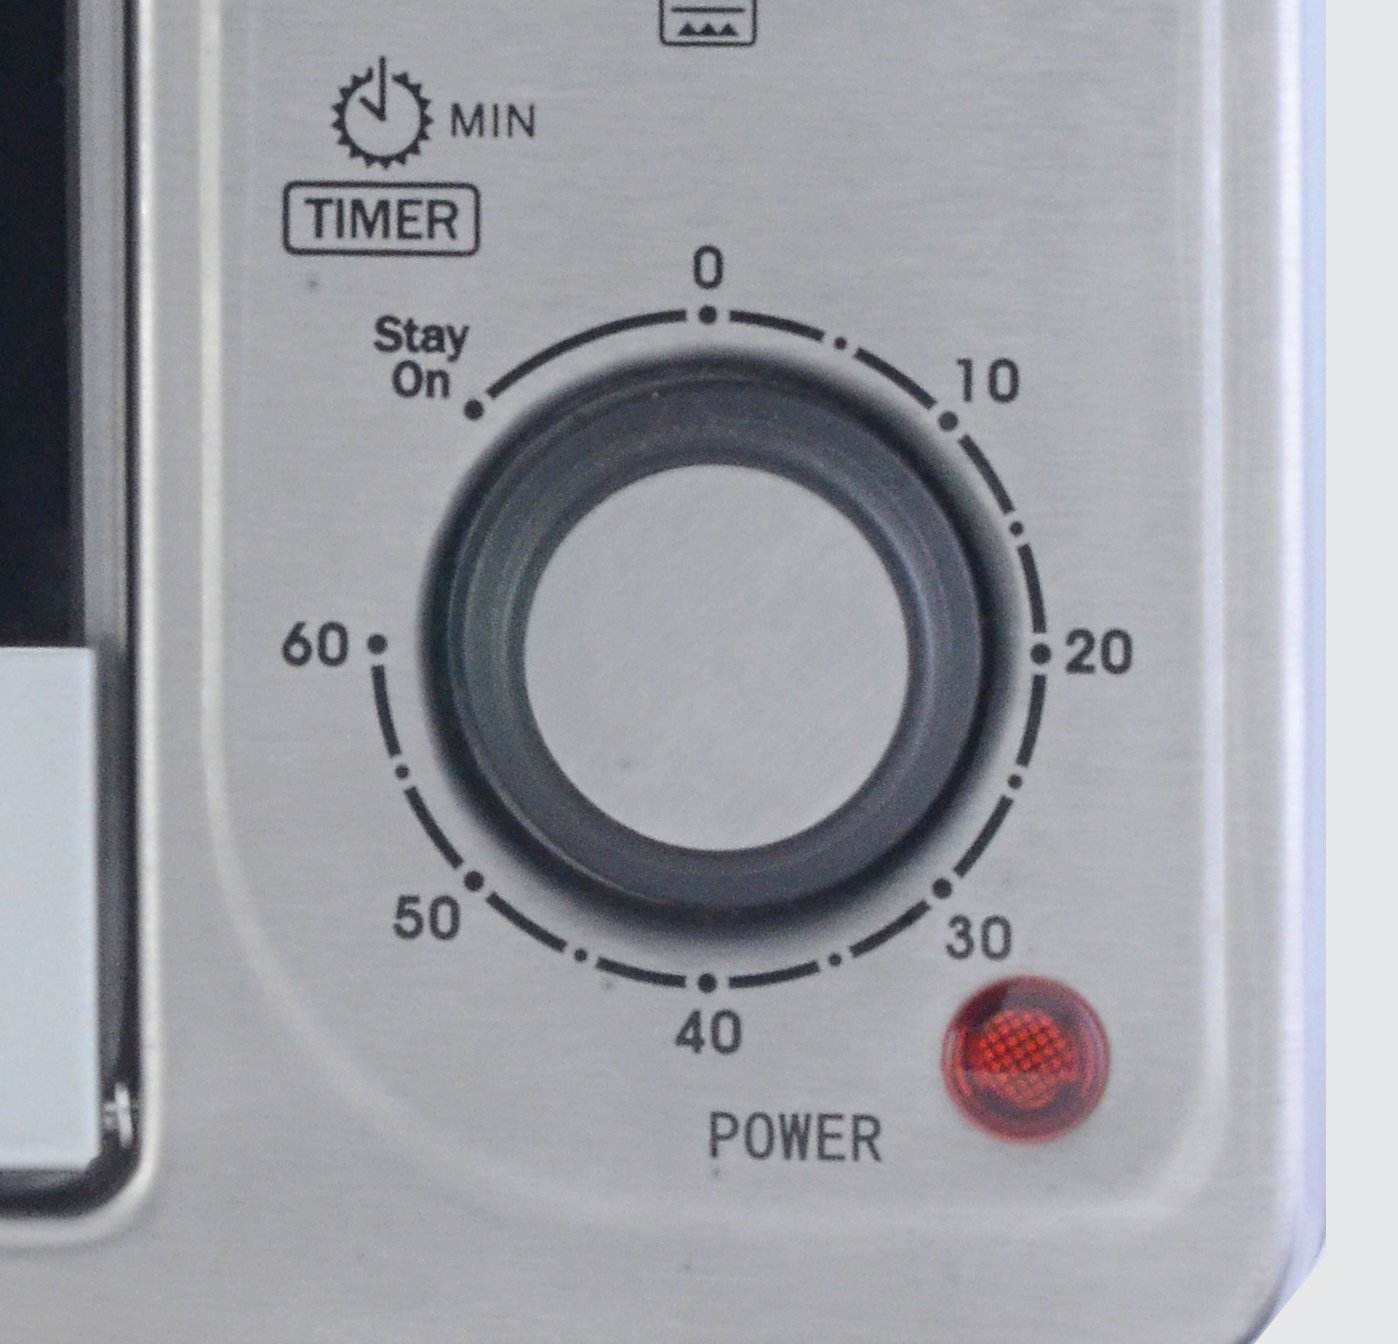 KREA EO36 - Horno eléctrico de convección, 36 litros, Acero ...